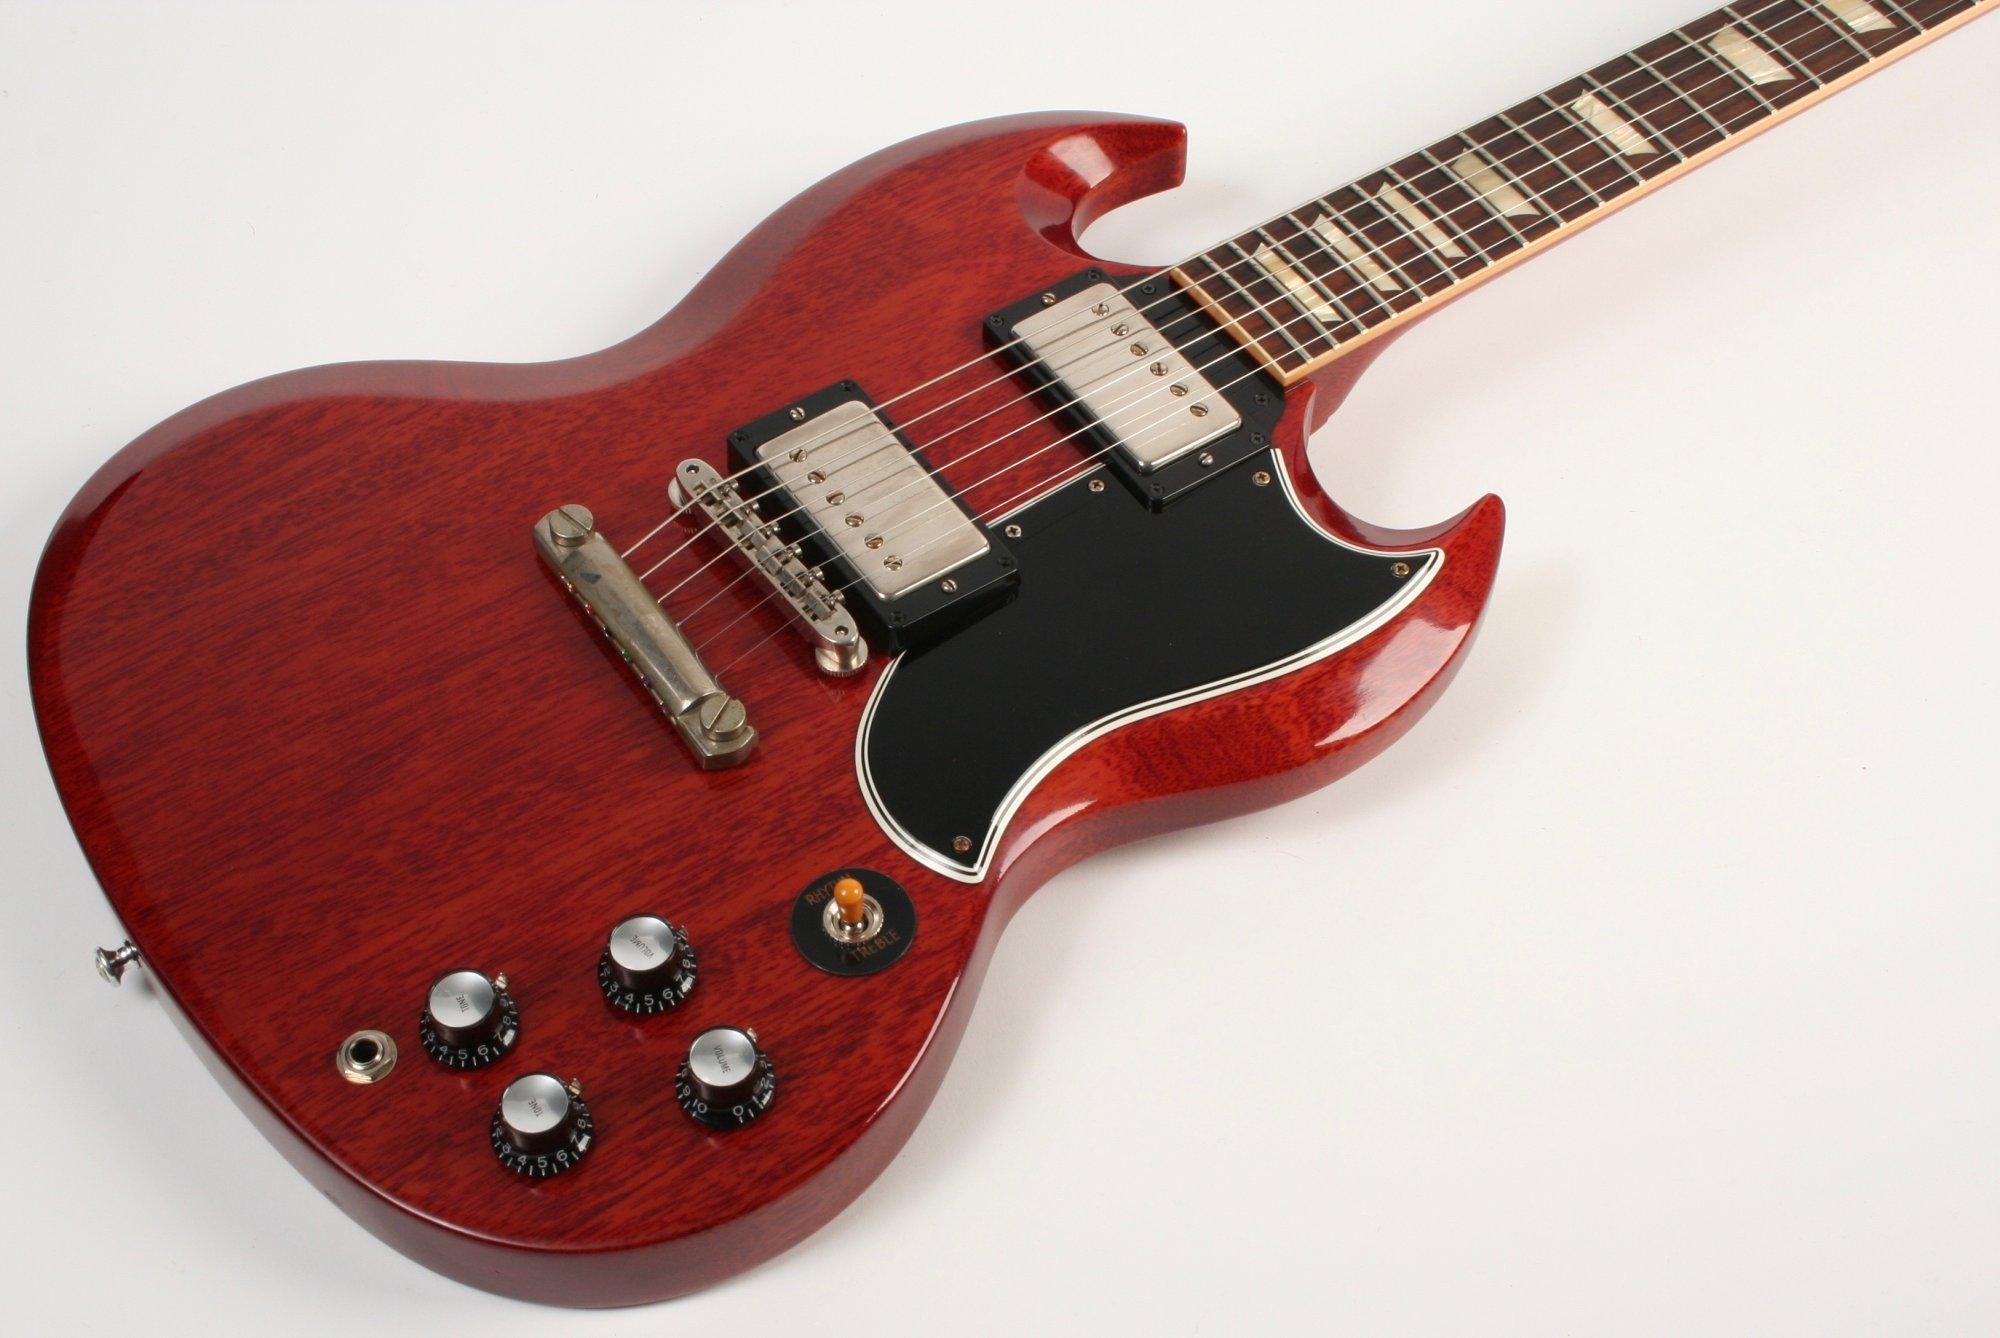 Gibson Custom Shop 1961 Les Paul SG Standard Reissue VOS Stop Bar 2019 Cherry Red